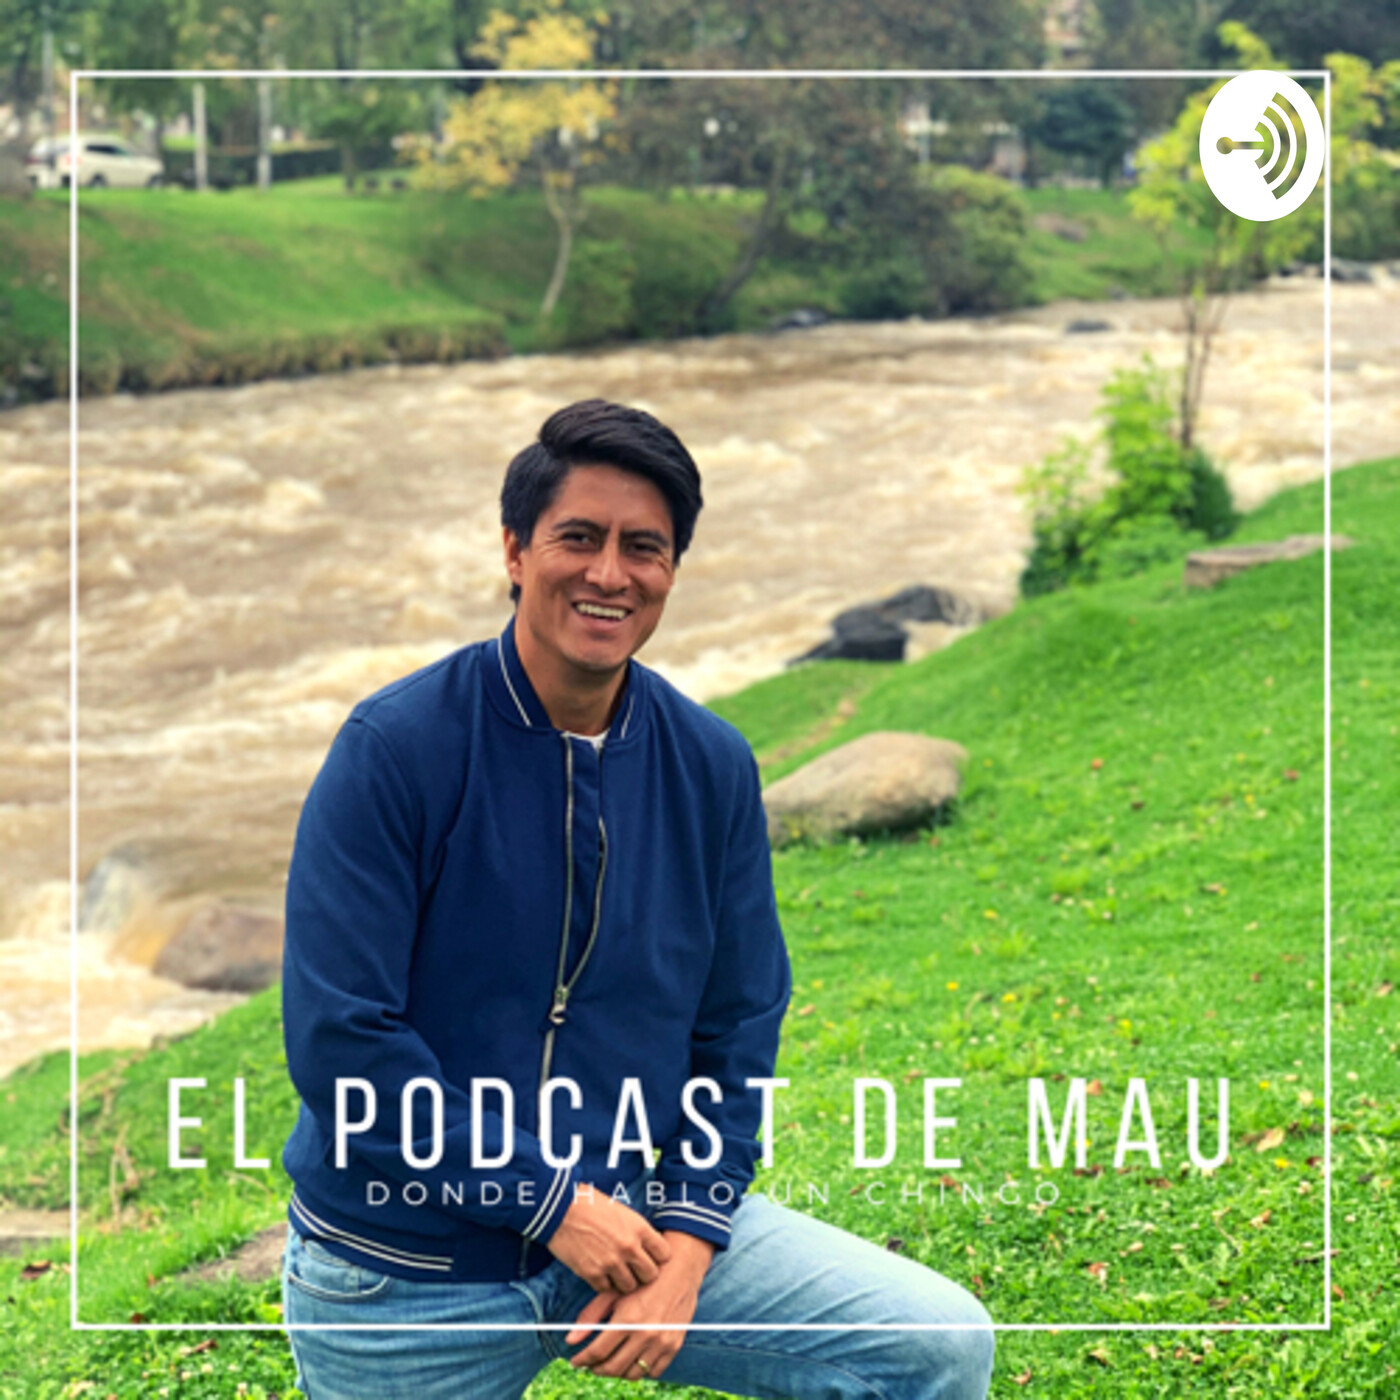 Episodio 15. Día de muertos con Dyana Pombar